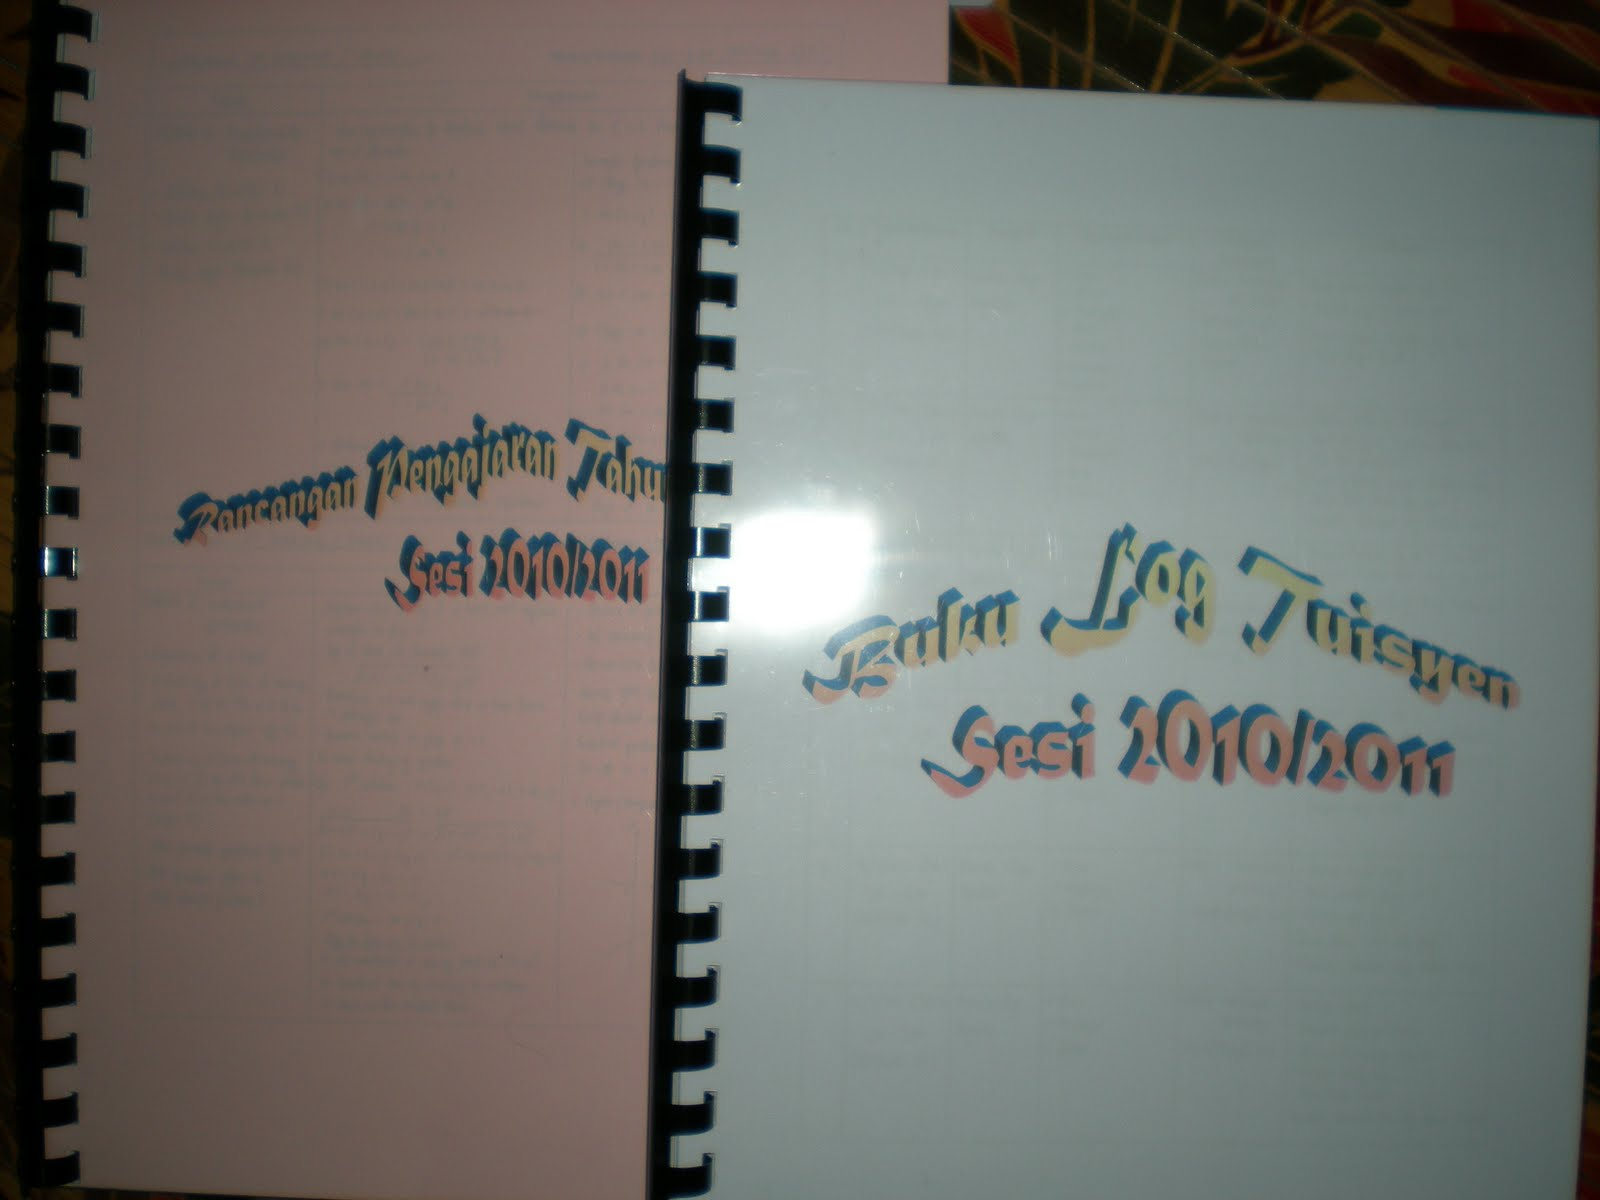 Inilah die buku RPT dan buku log tuisyen aku yang aku wat sendiri